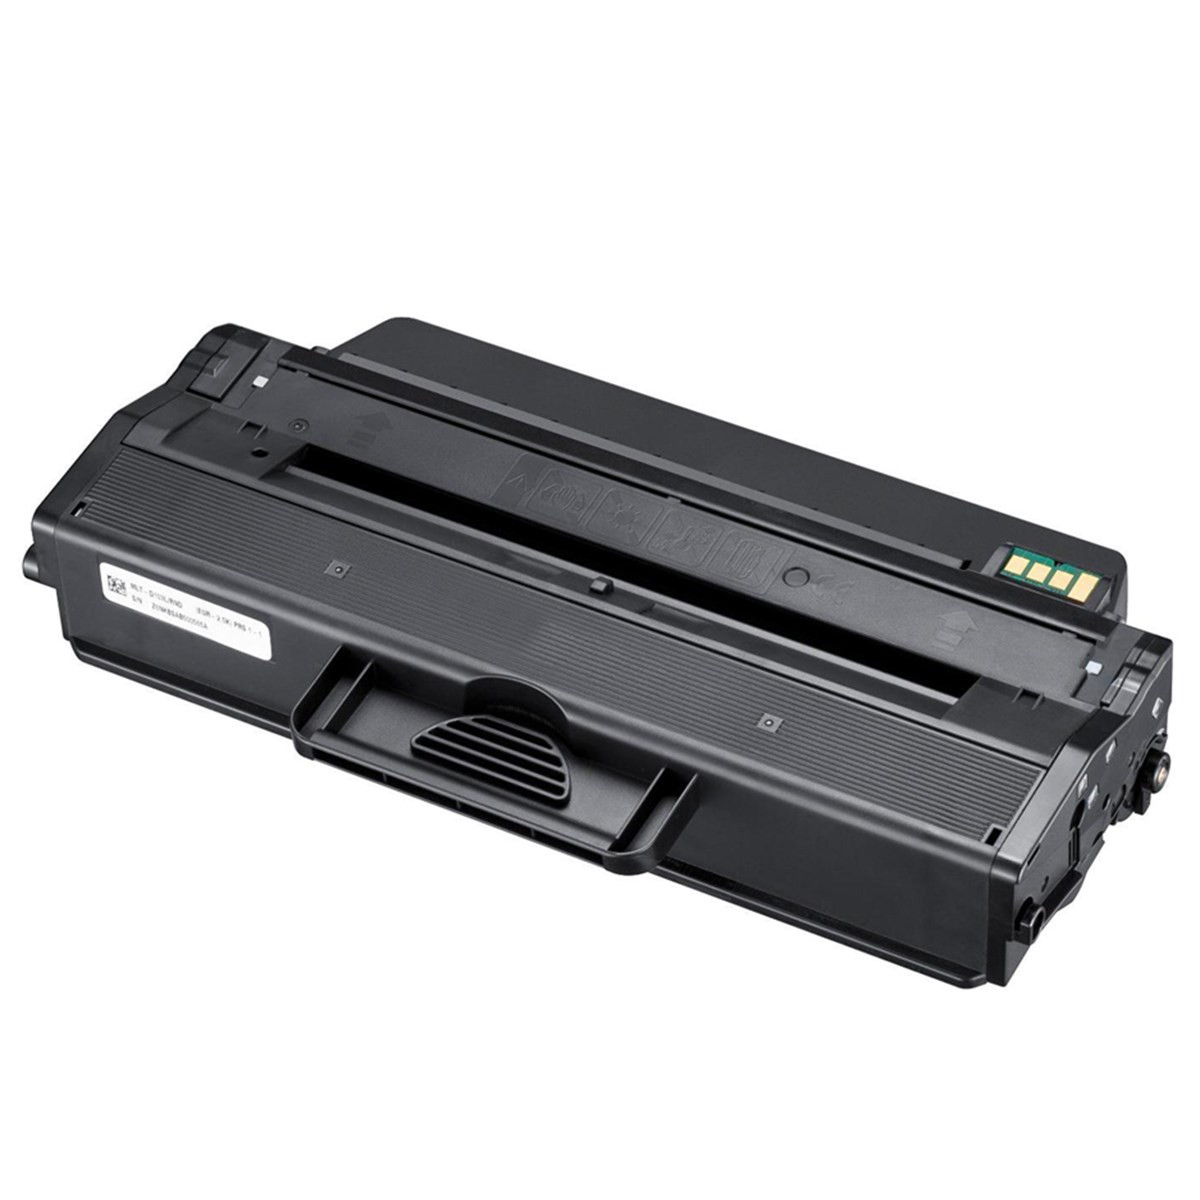 Toner Compatível com Samsung MLT-D103L   ML2950 ML2955 SCX4705 SCX4727 SCX4728 SCX4729   Premium 5k